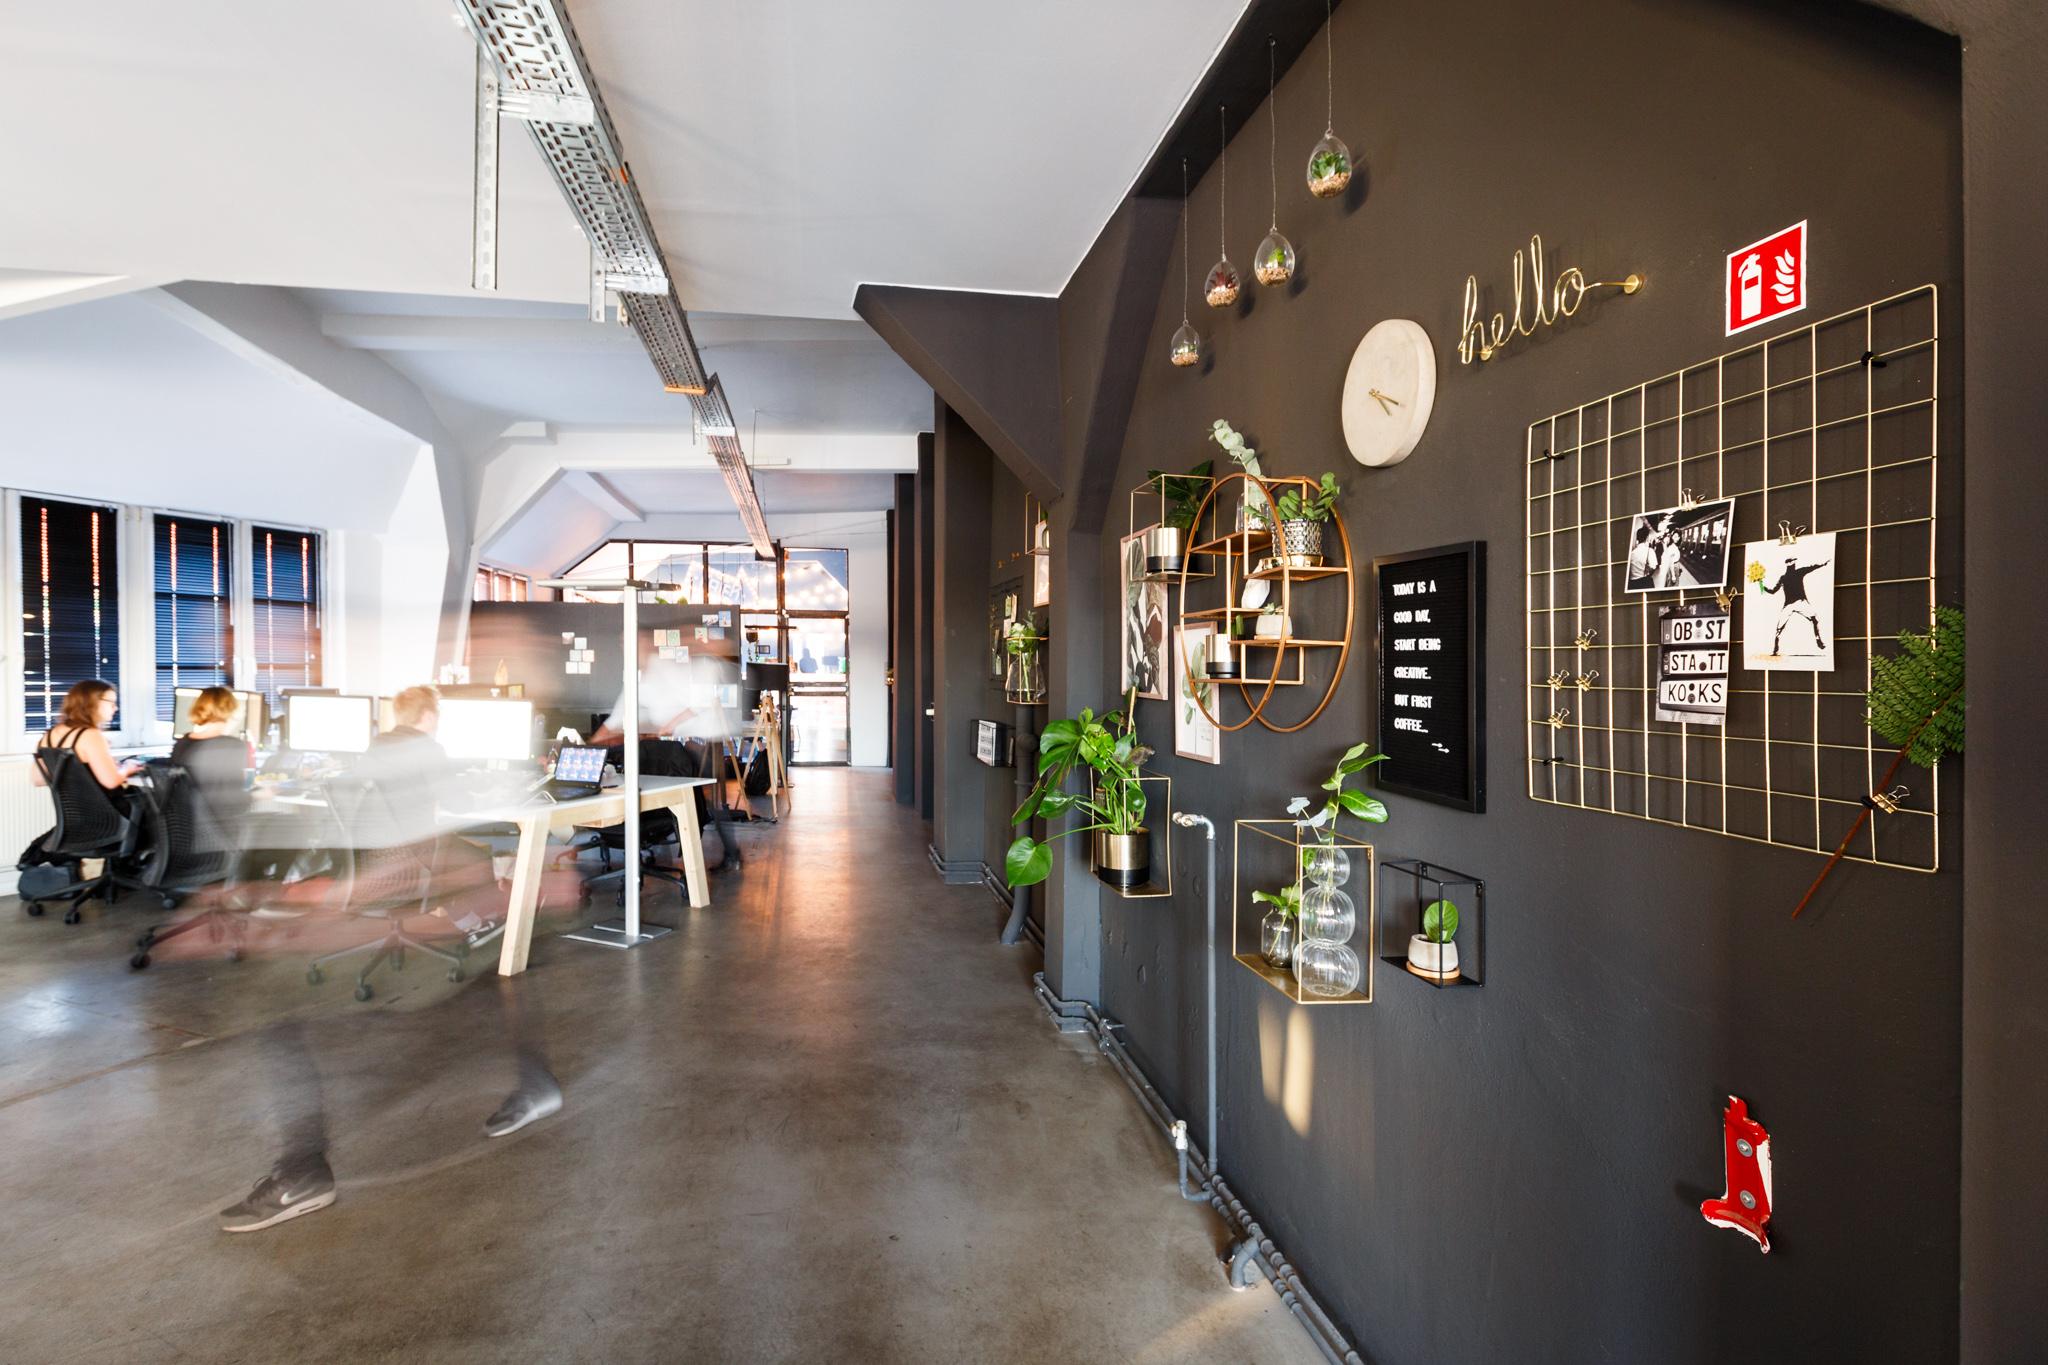 PeakAce-Büro-OpenSpace-Dittmarandfriends.jpg